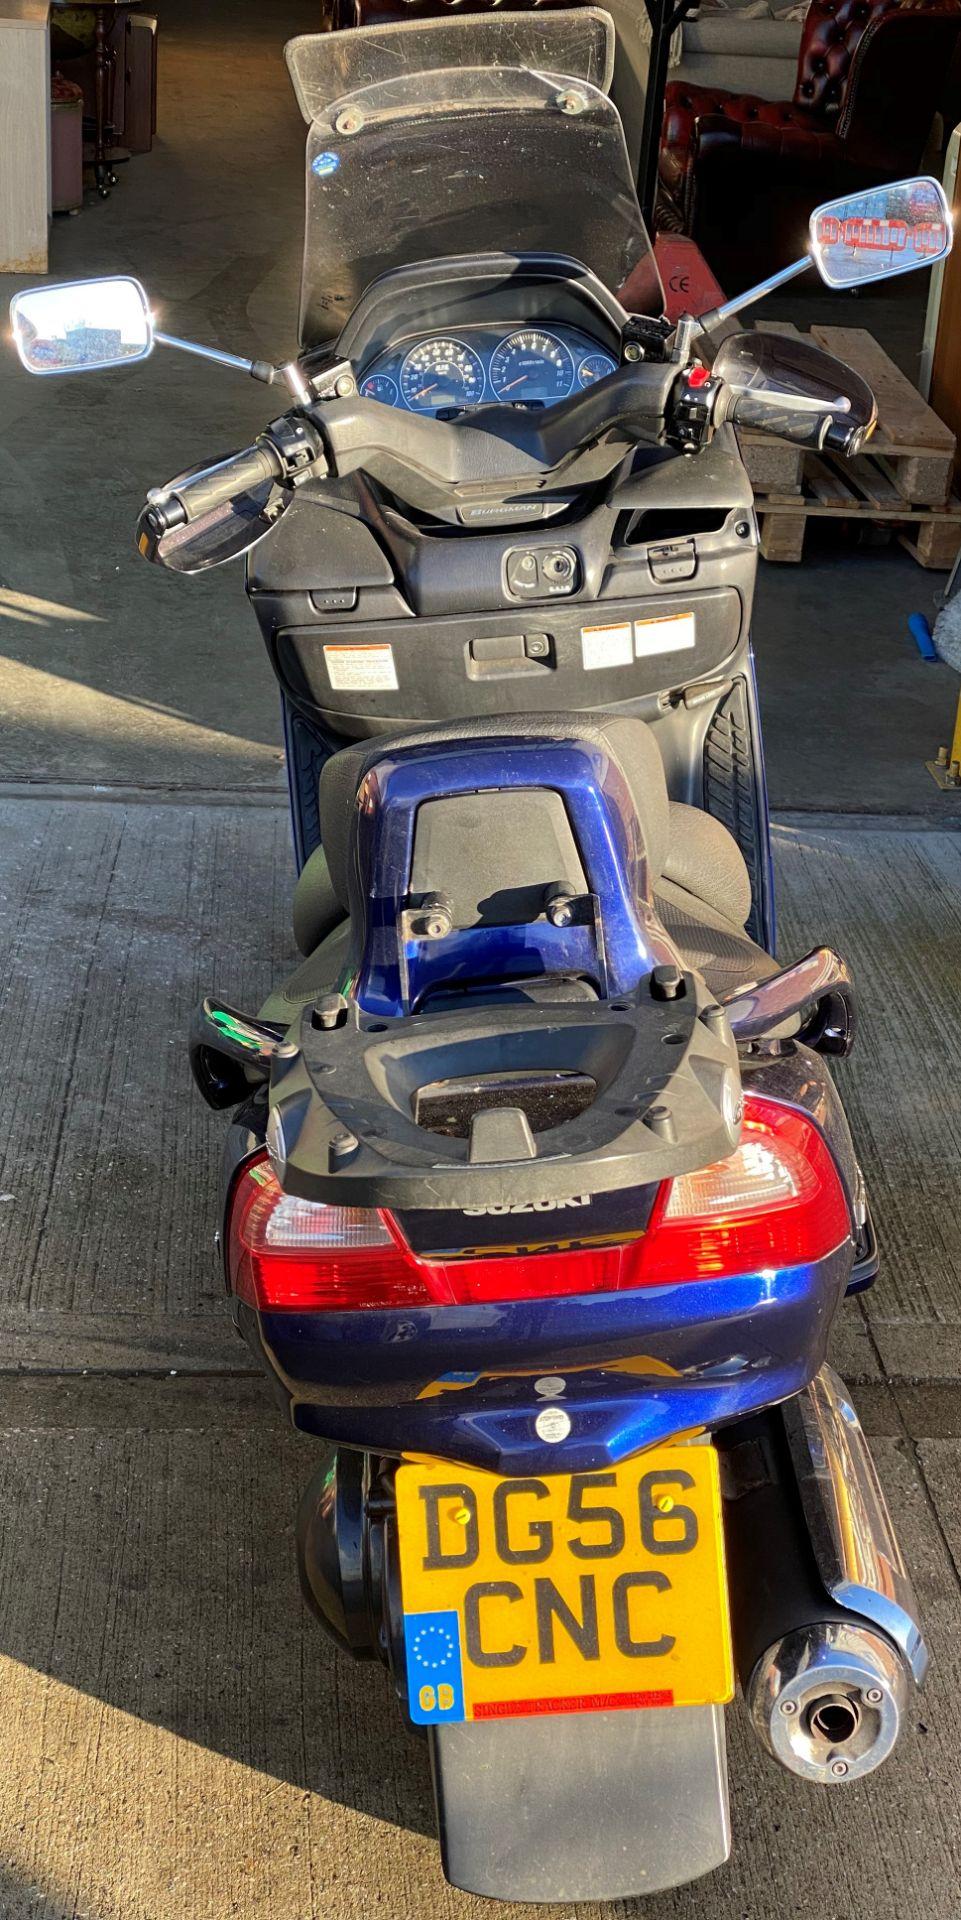 ON BEHALF OF THE INSOLVENCY SERVICE - SUZUKI BERGMAN 400 AN 400KG MOTORCYCLE - petrol - blue Reg - Image 2 of 10